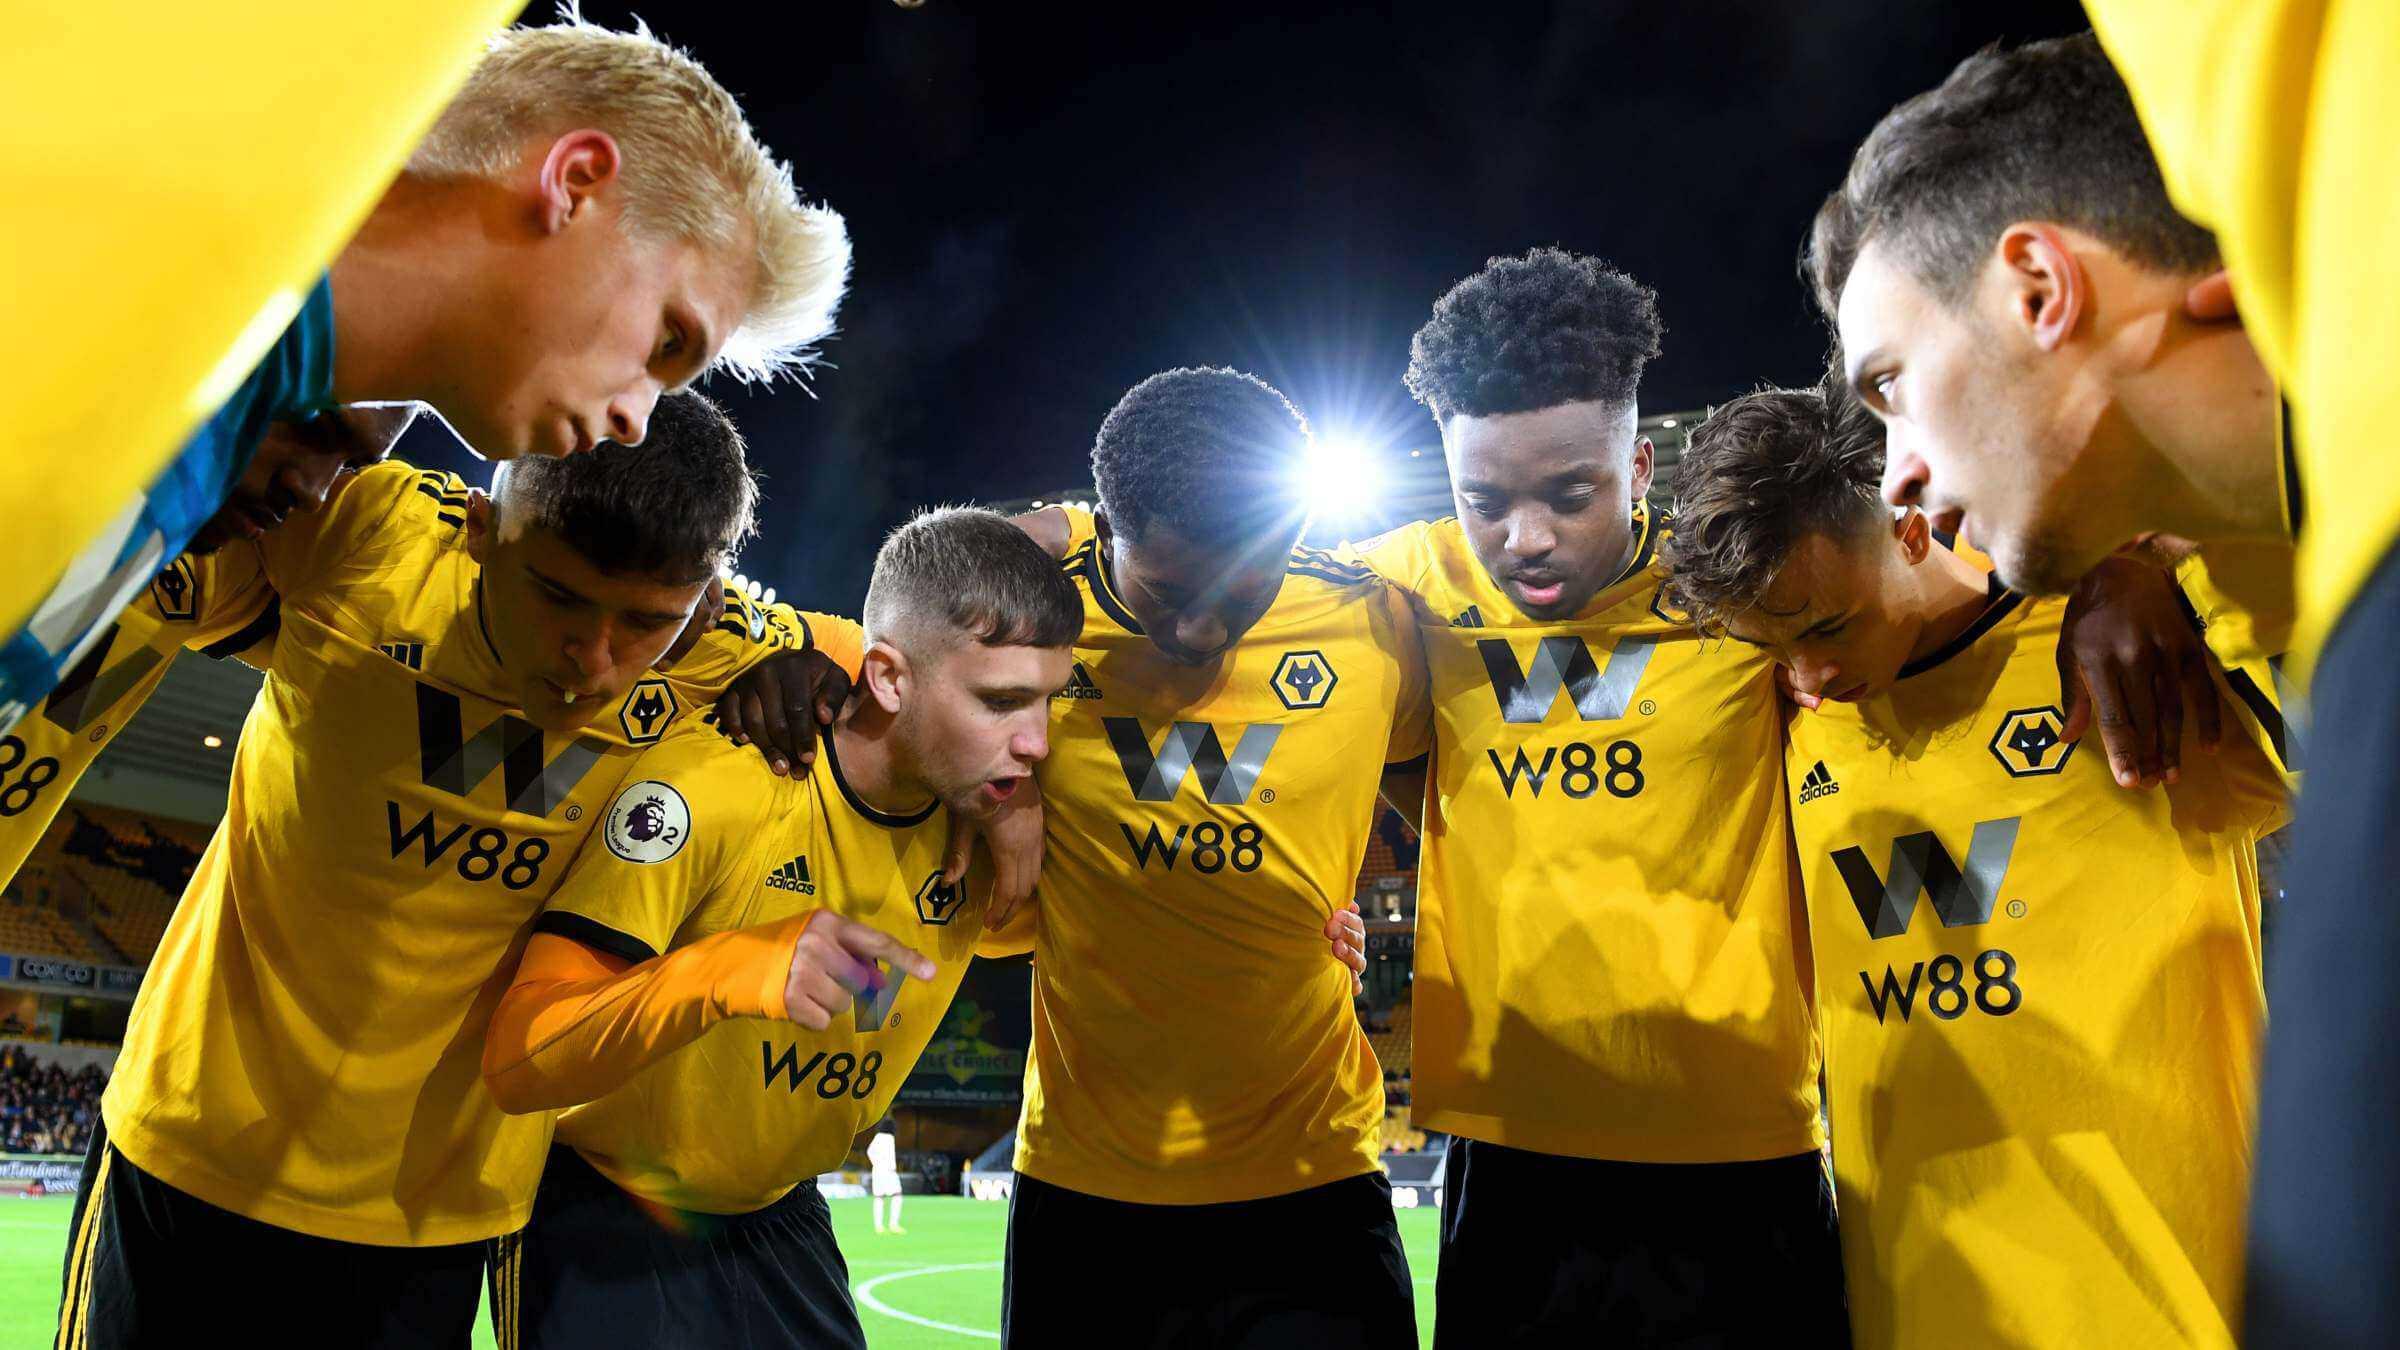 wolverhampton wanderers fc soccer team 2019